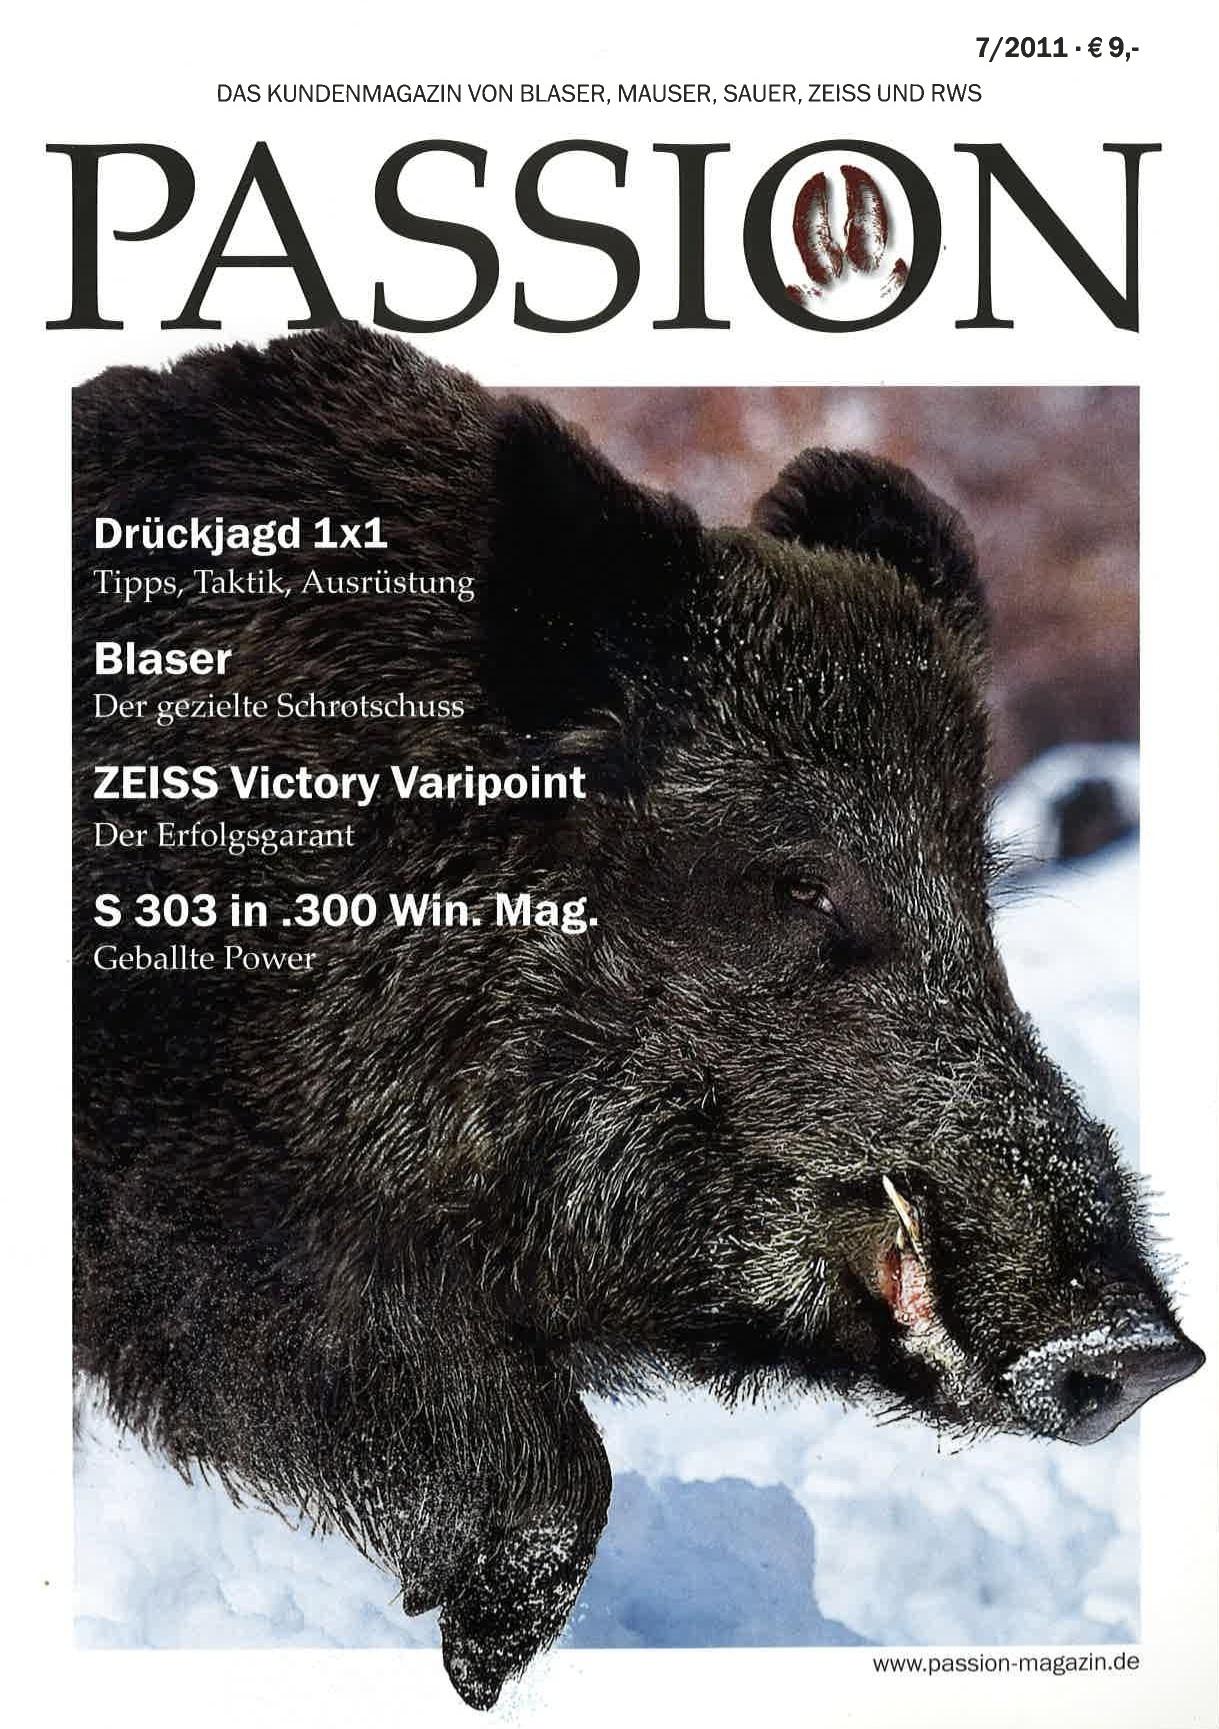 Passion2011.jpg